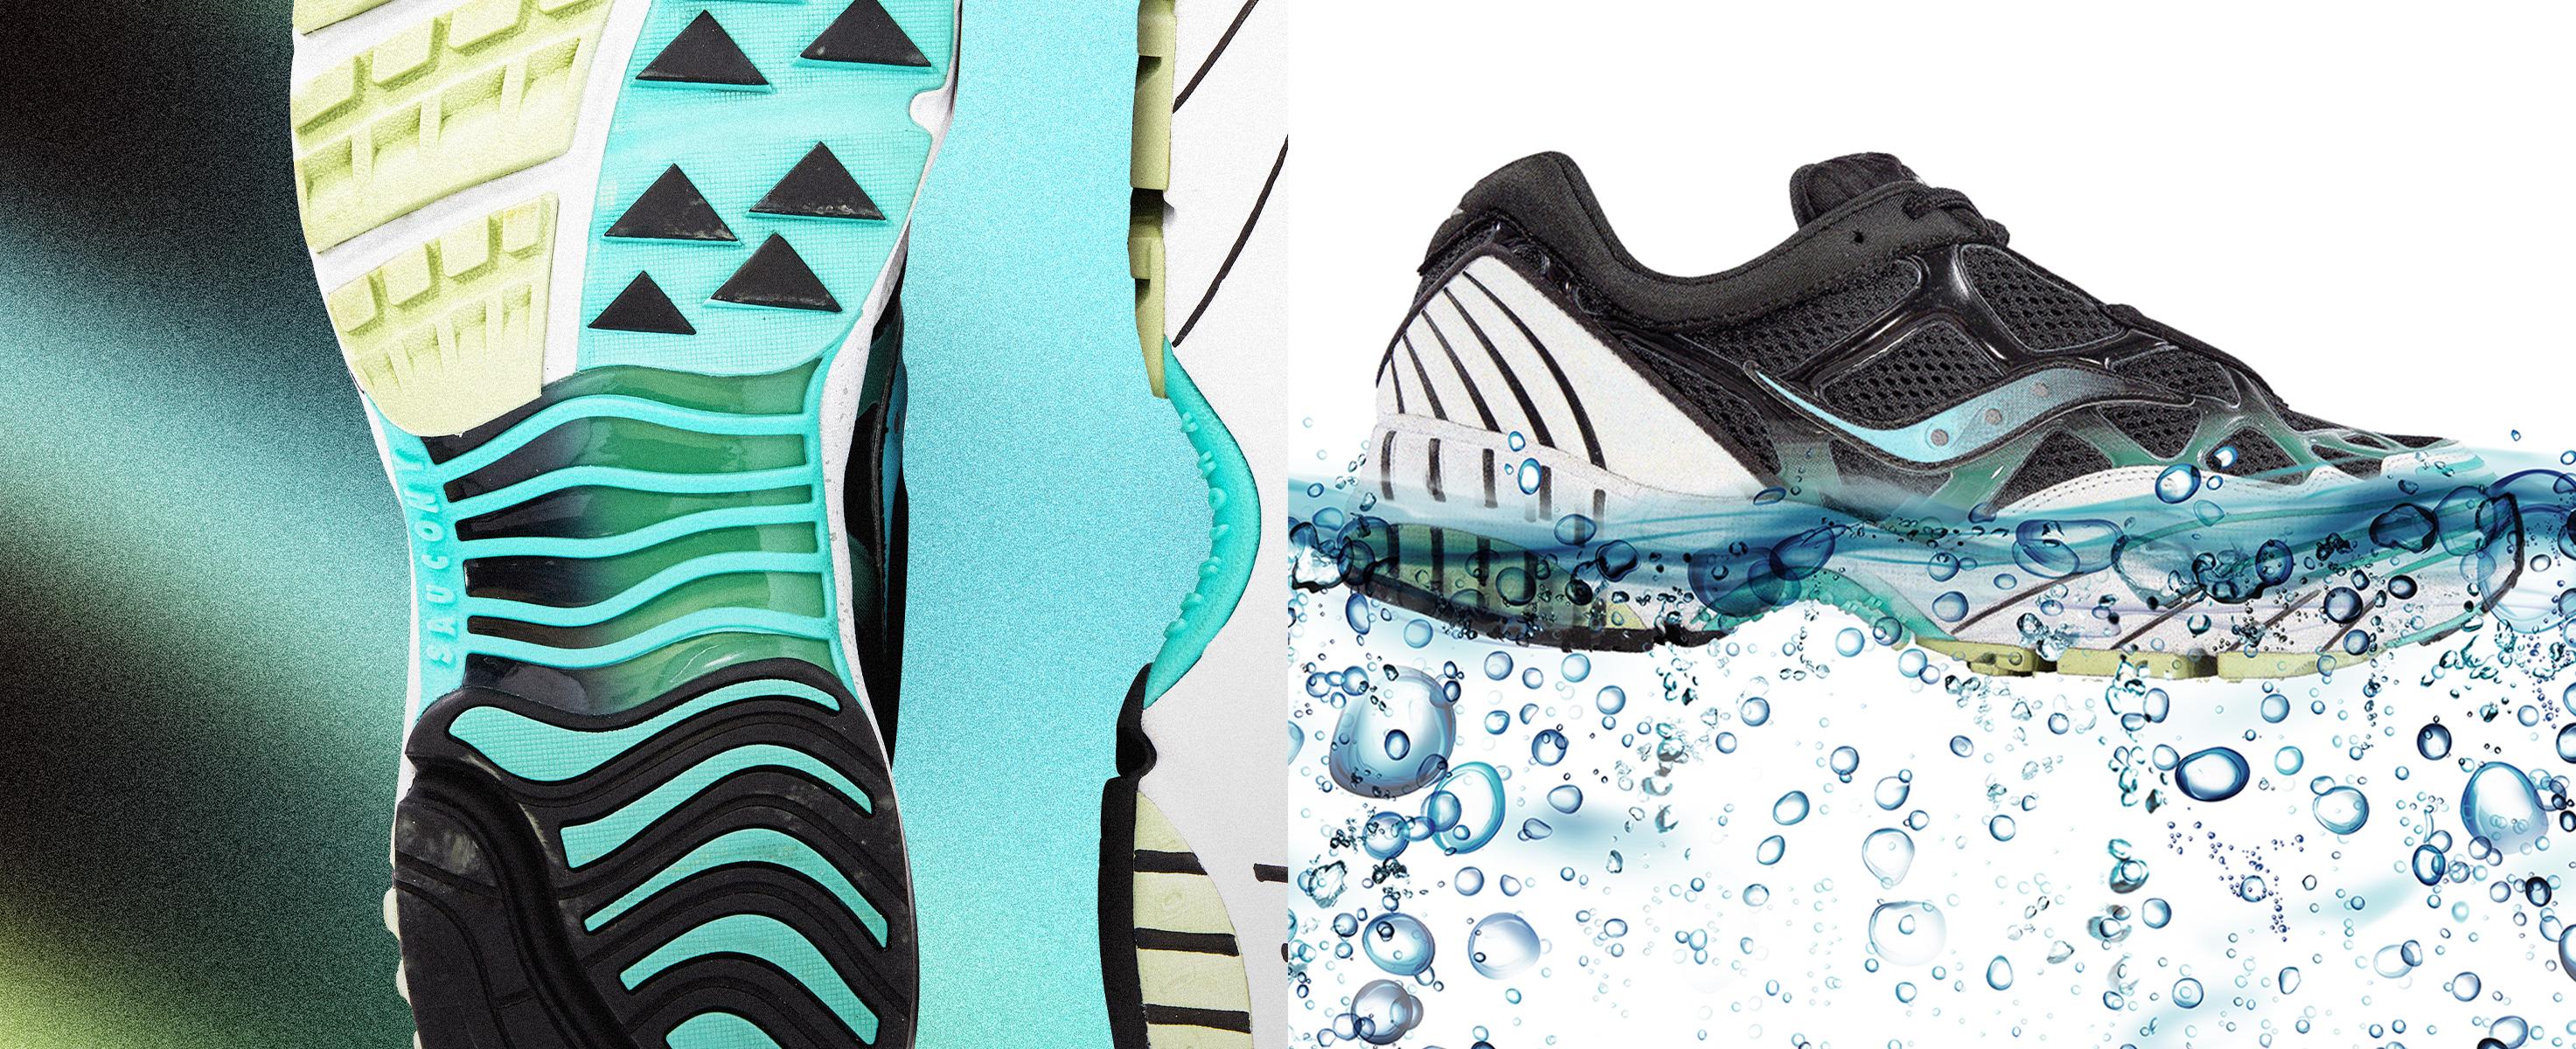 Saucony Grid Black Pearl Shoe Floating in Water.